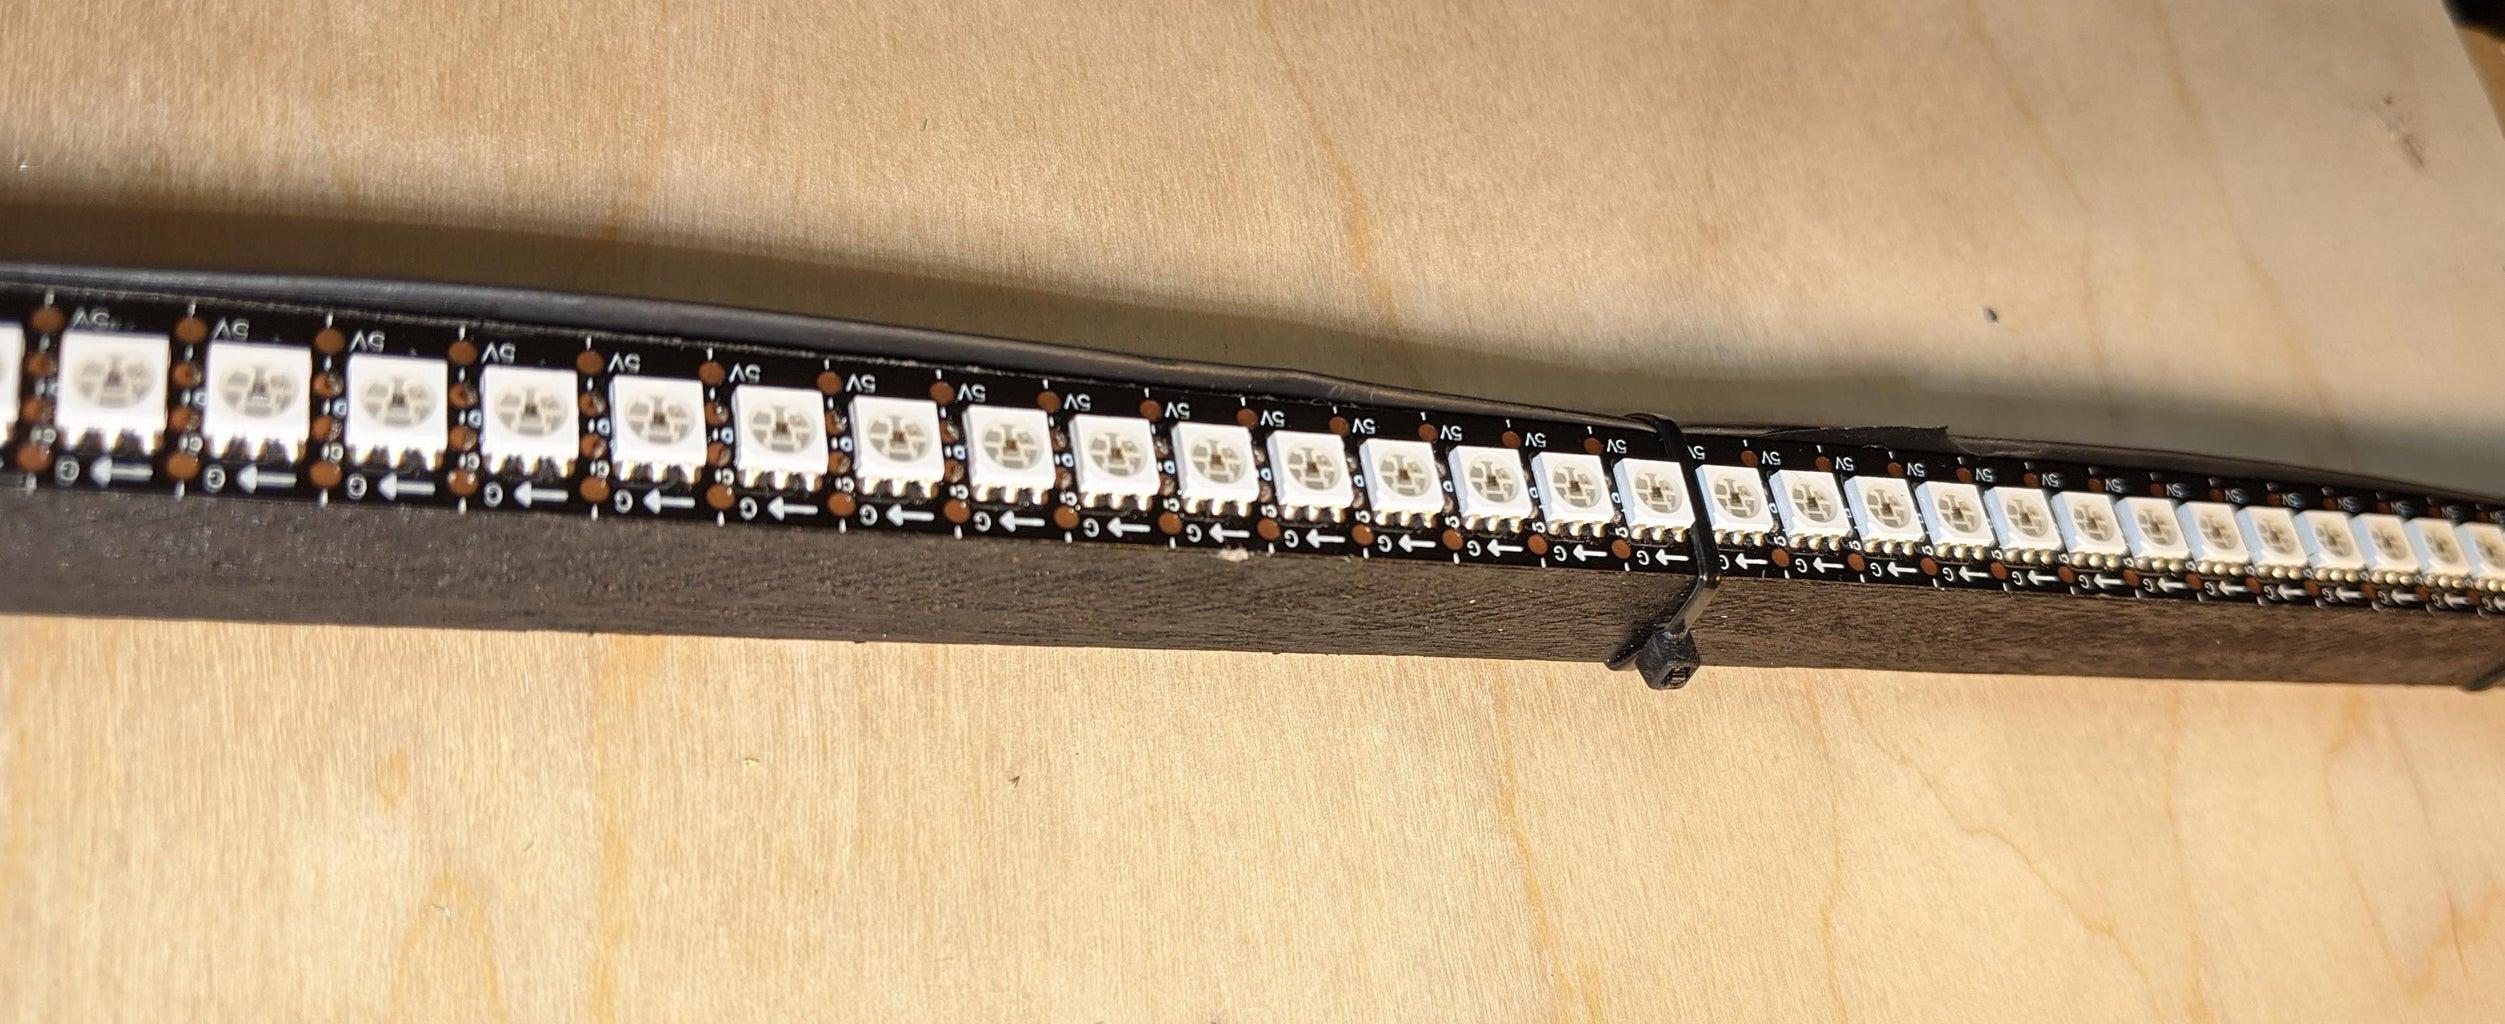 Wiring the Control Board